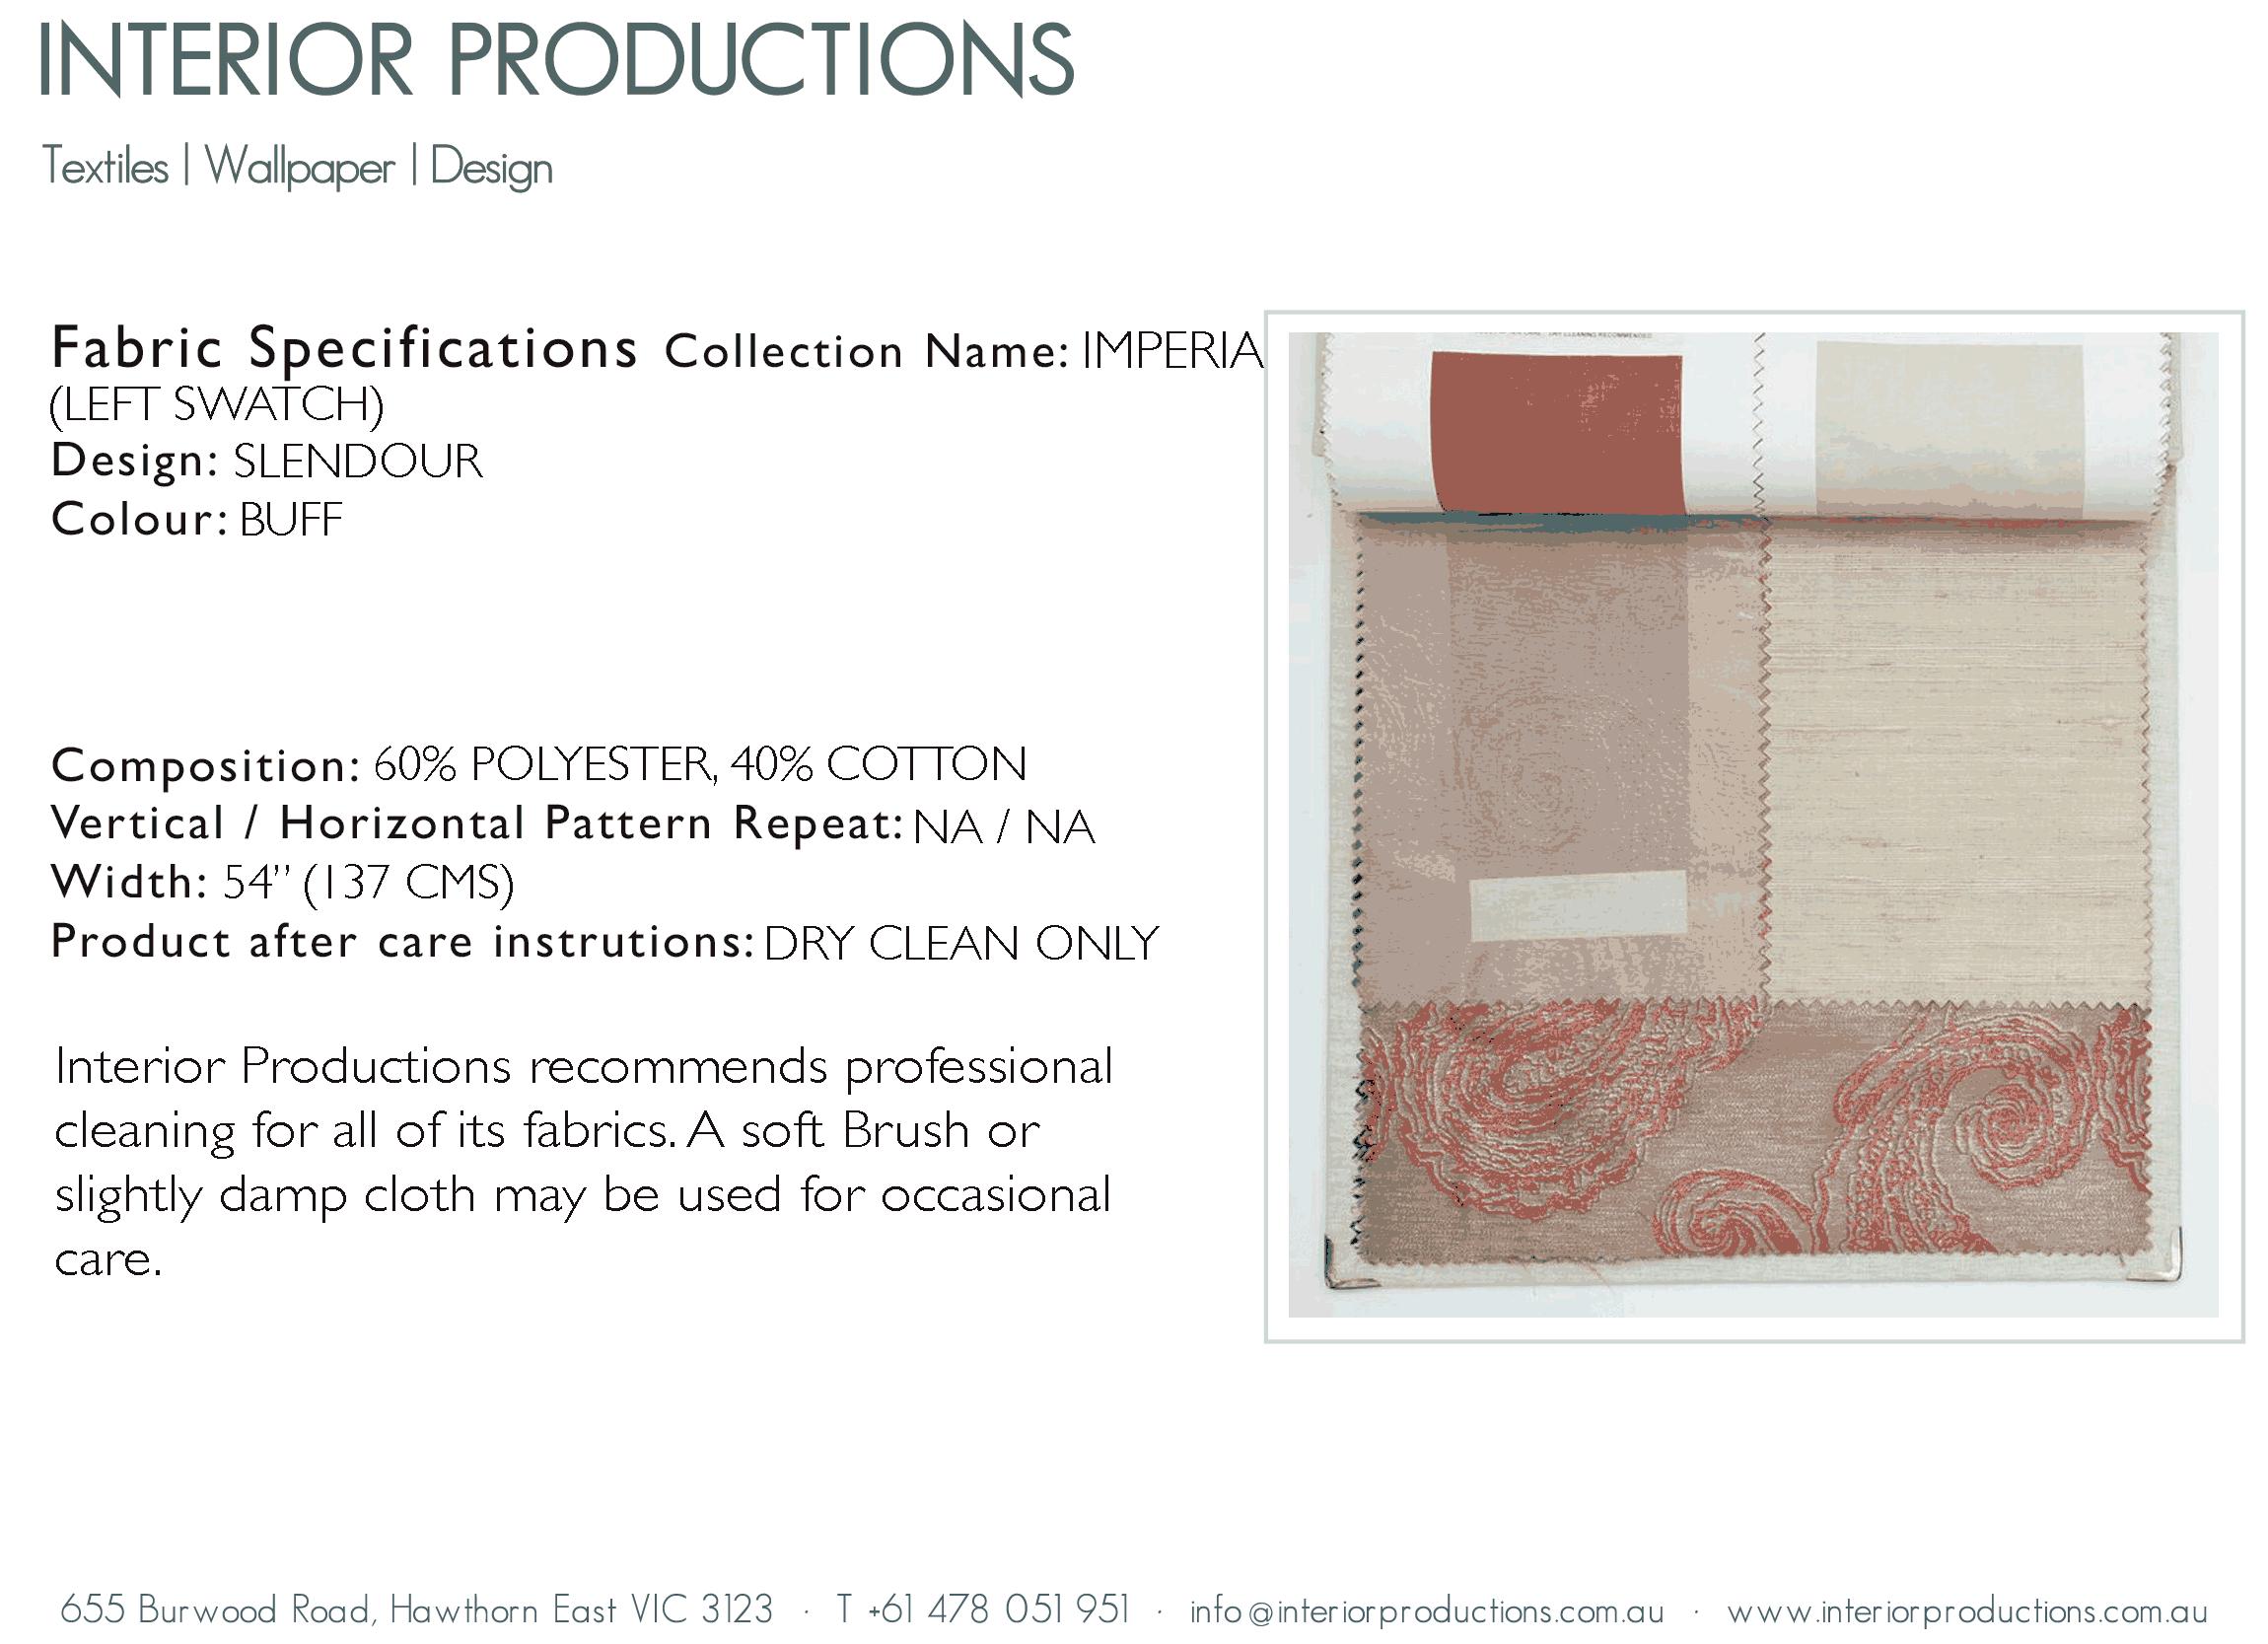 interior_productions_SPLENDOUR---BUFF